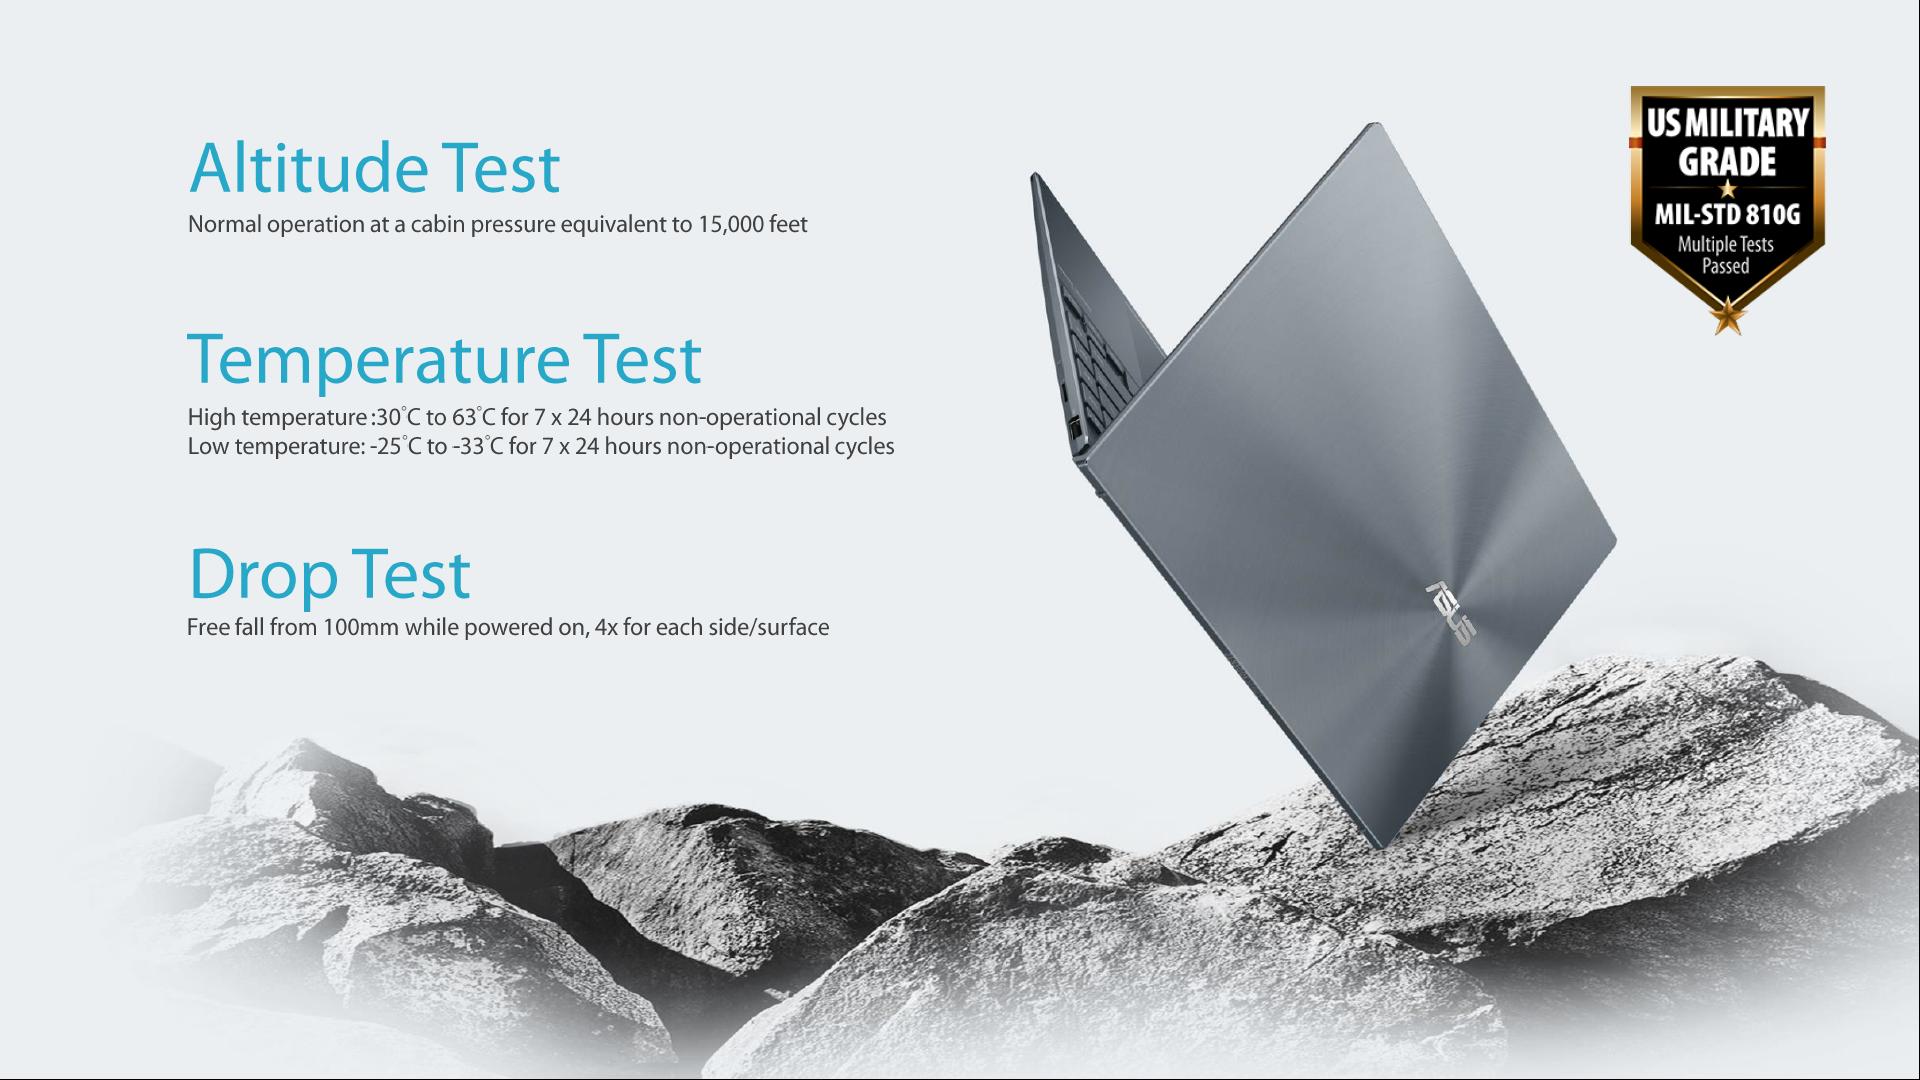 ZenBook độ bền chuẩn quân đội Mỹ